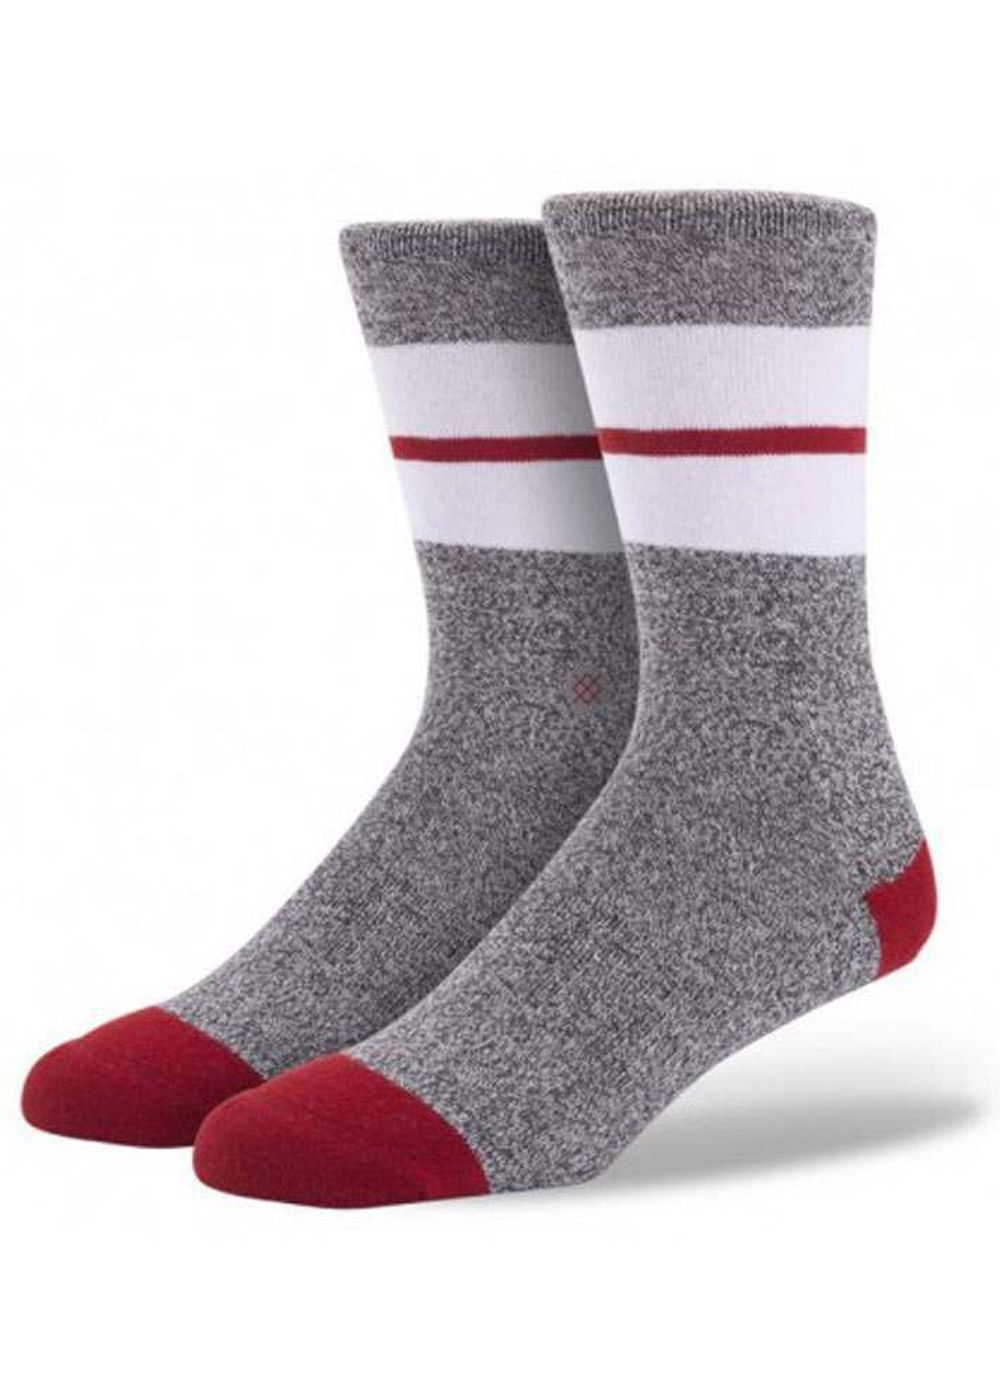 STANCE SEQUOIA SOCKS Grey